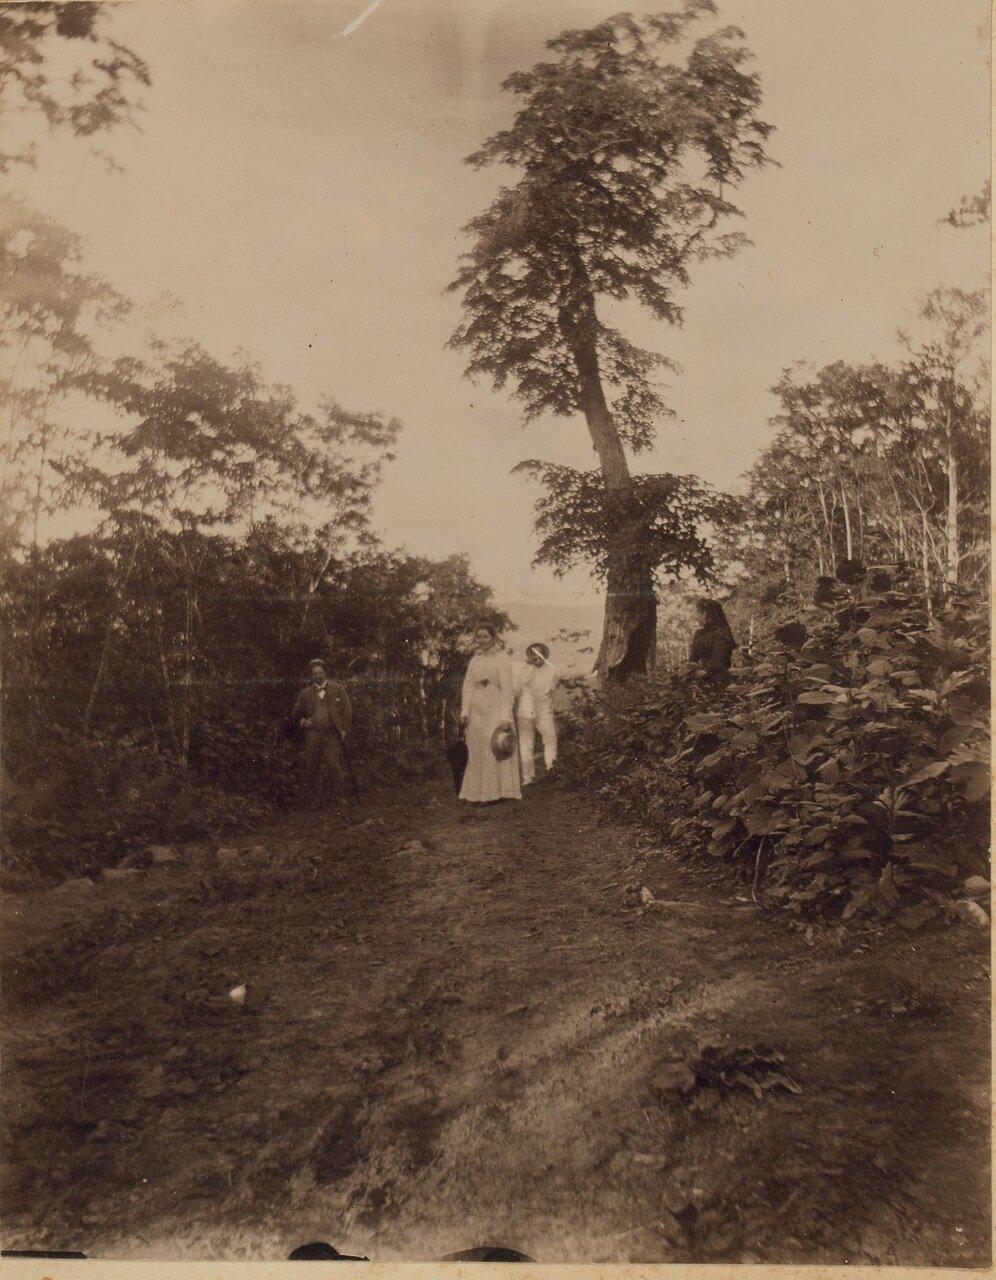 Прогулка в лесу, в районе Владивостока, май 1899